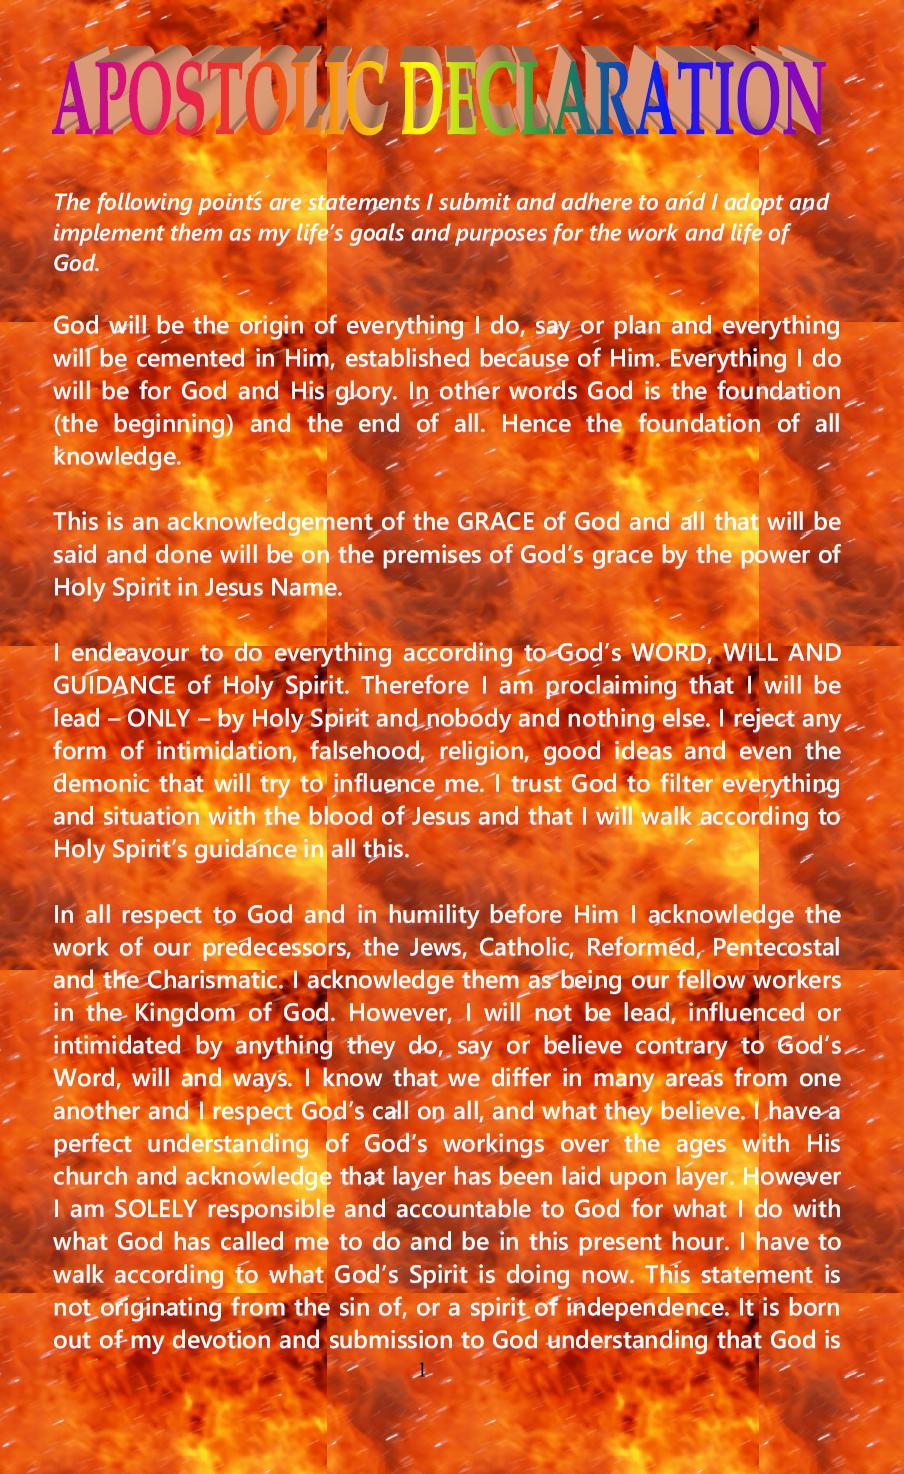 APOSTOLIC DECLARATION